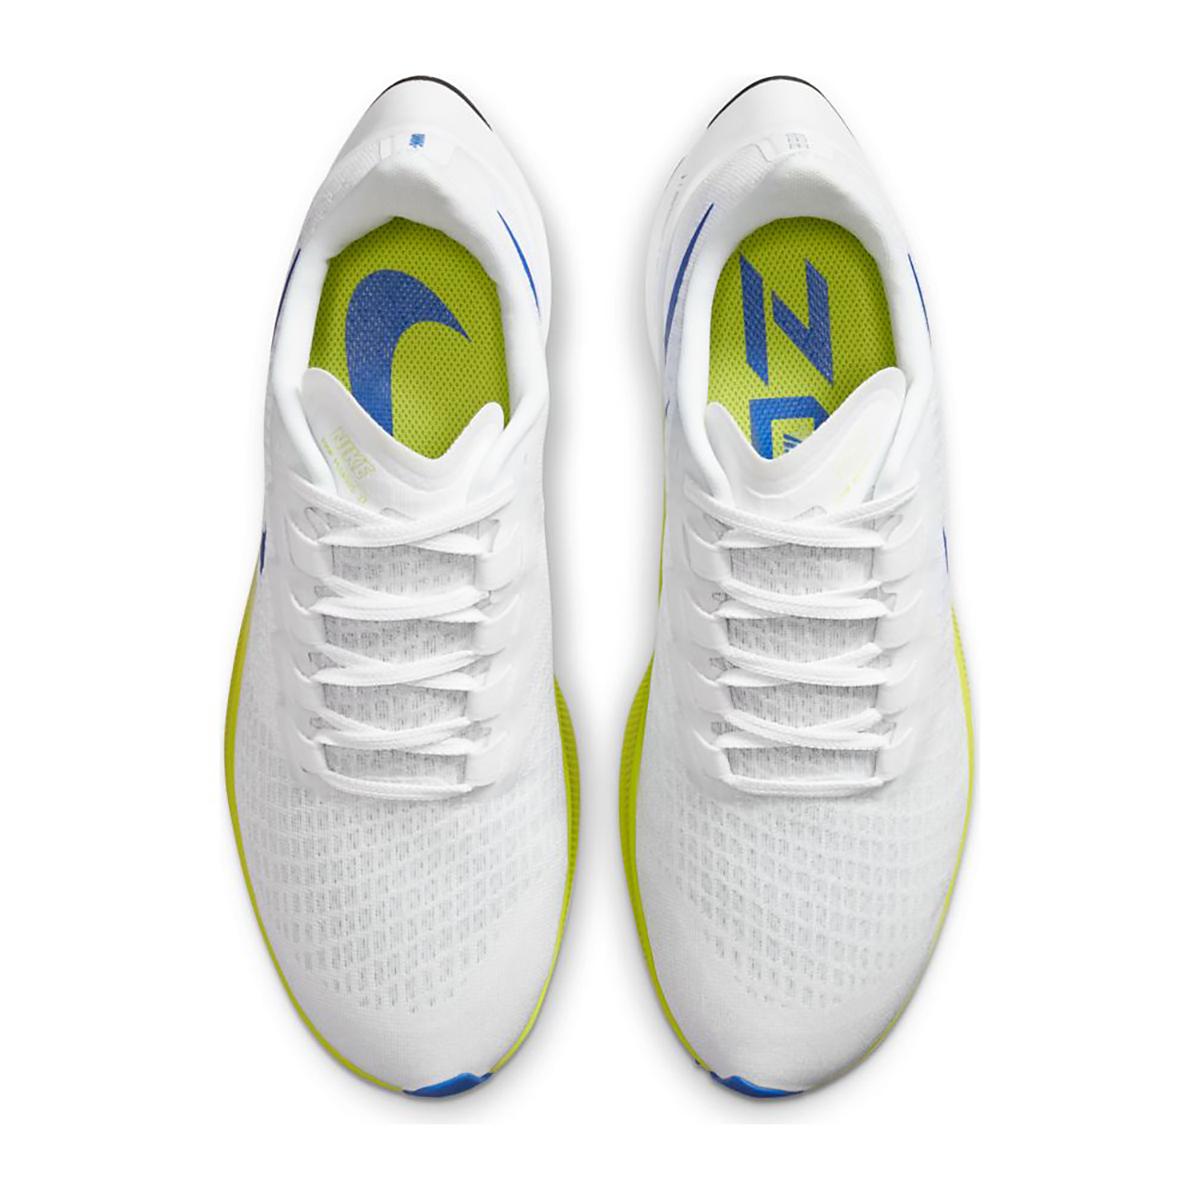 Men's Nike Air Zoom Pegasus 37 Running Shoe - Color: White/Racer Blue/Cyber/Black - Size: 6 - Width: Regular, White/Racer Blue/Cyber/Black, large, image 4